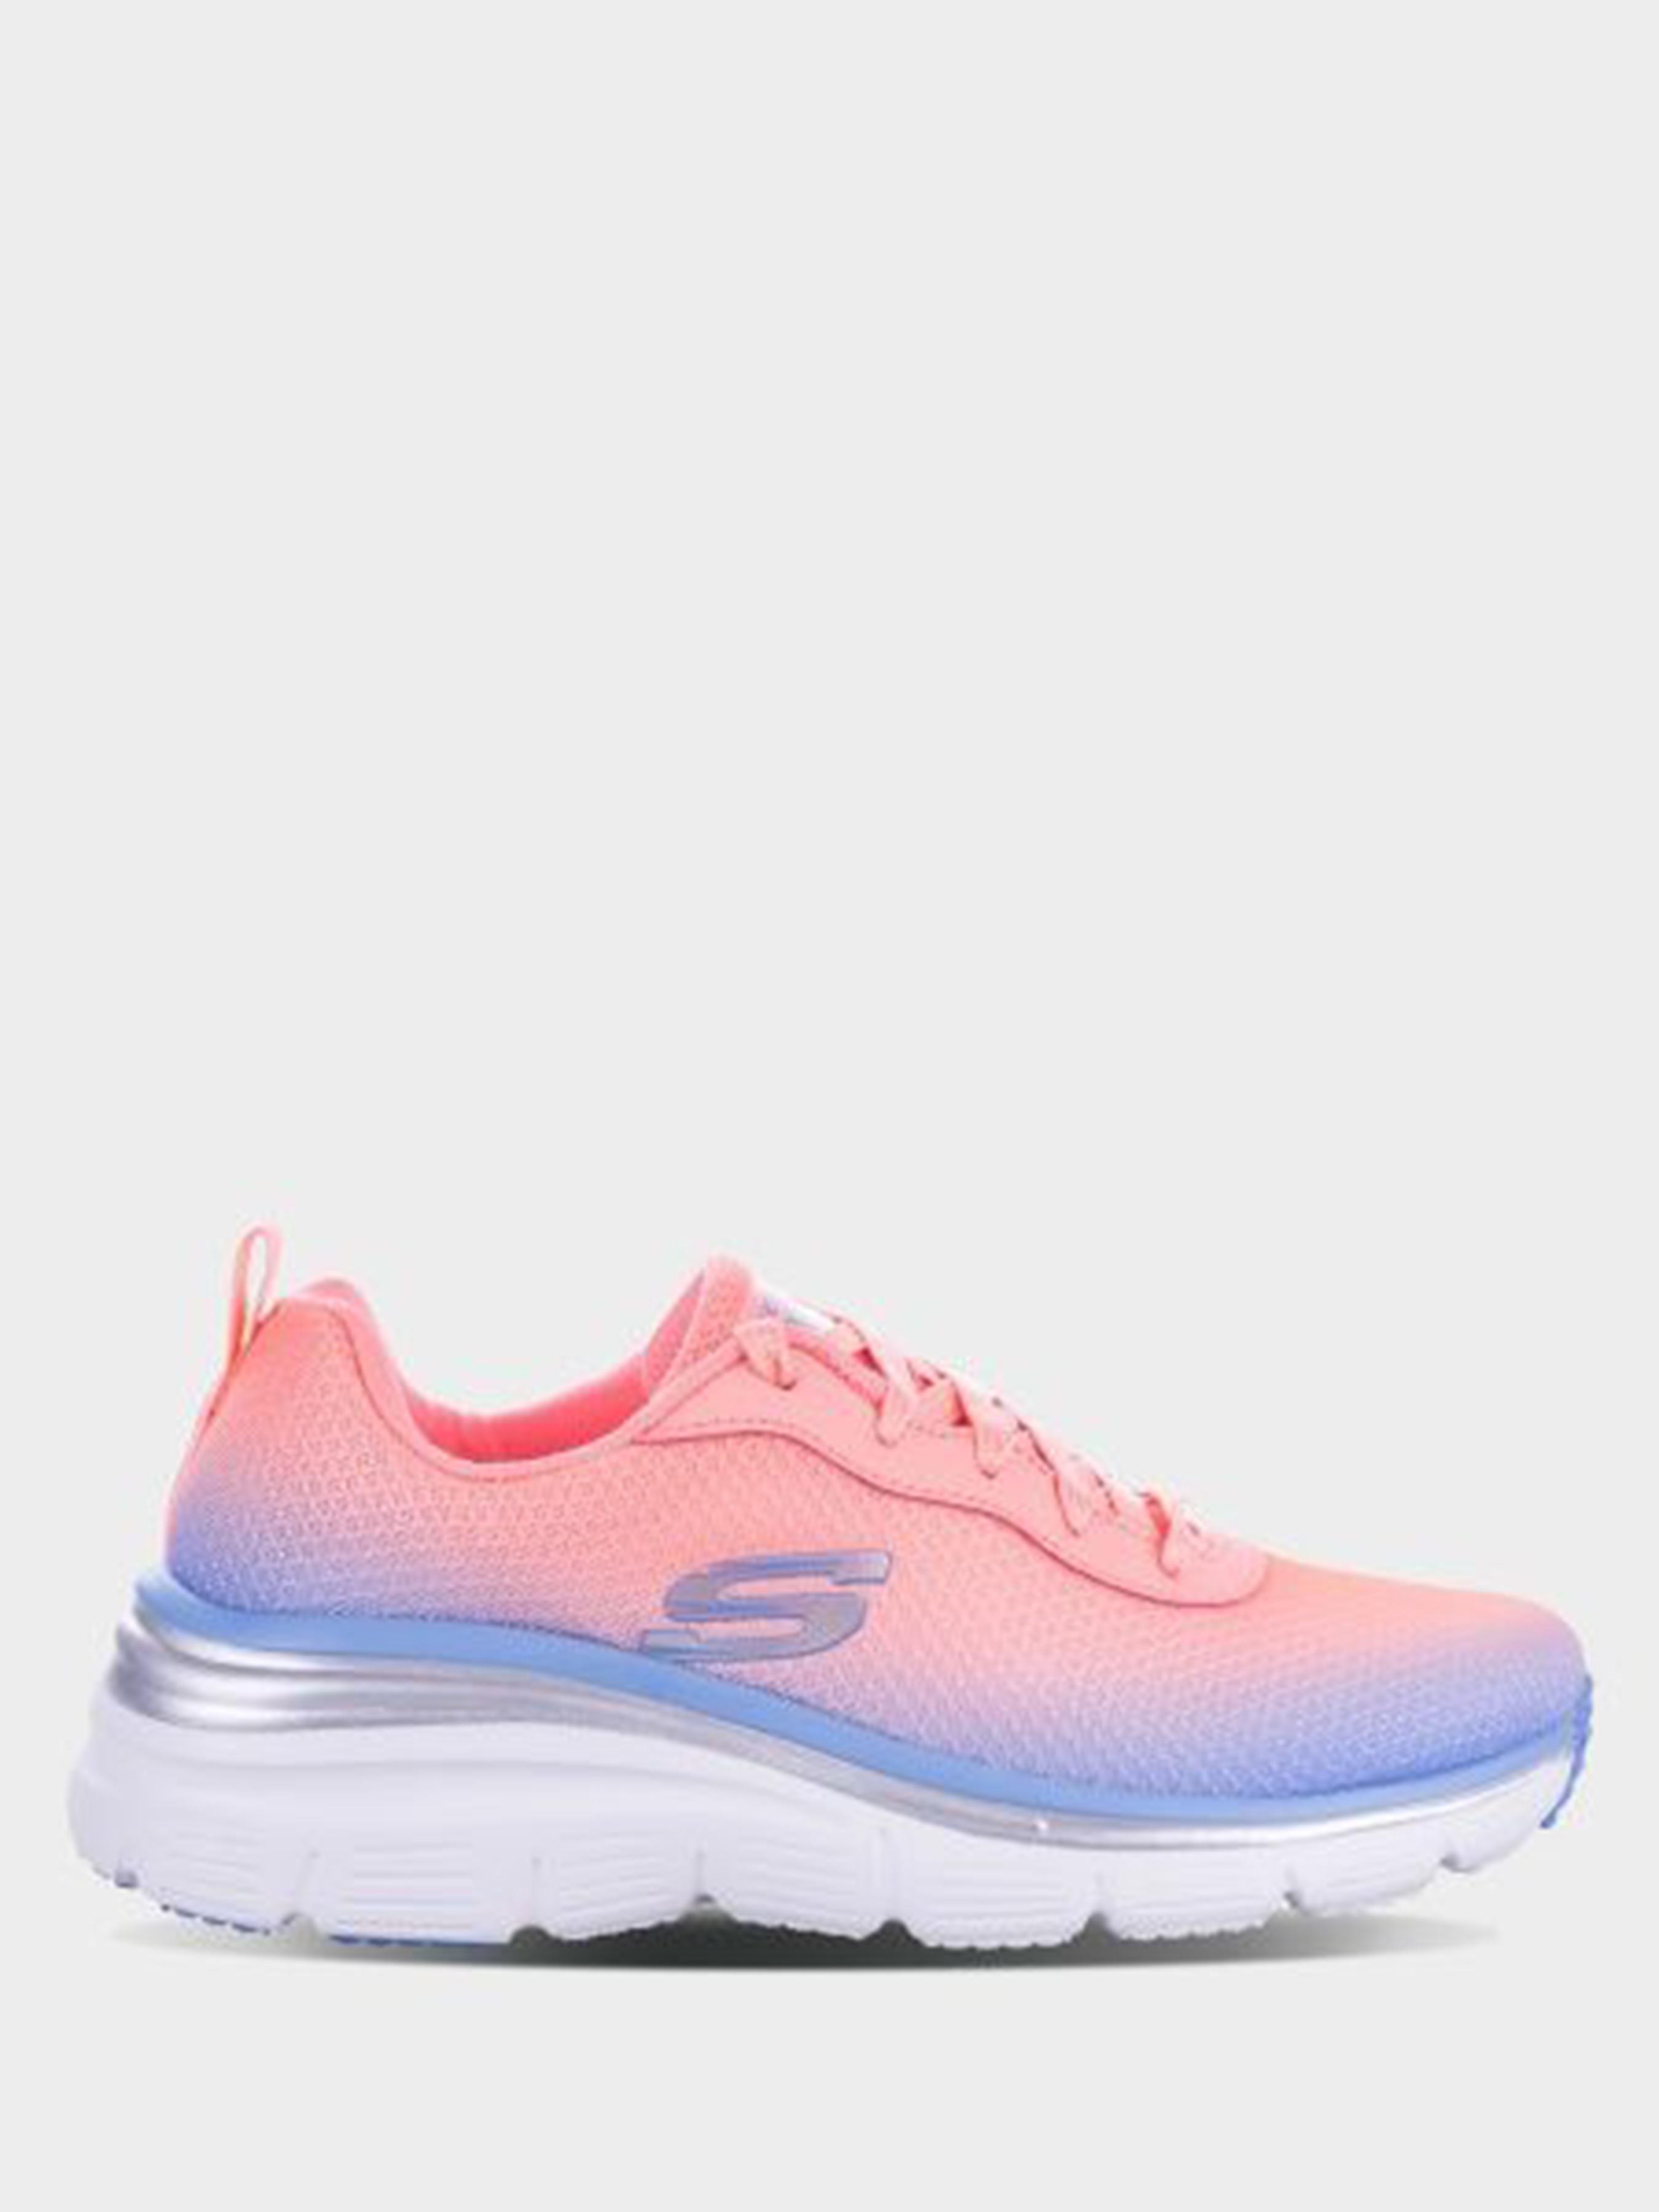 Кроссовки для женщин Skechers KW4702 продажа, 2017